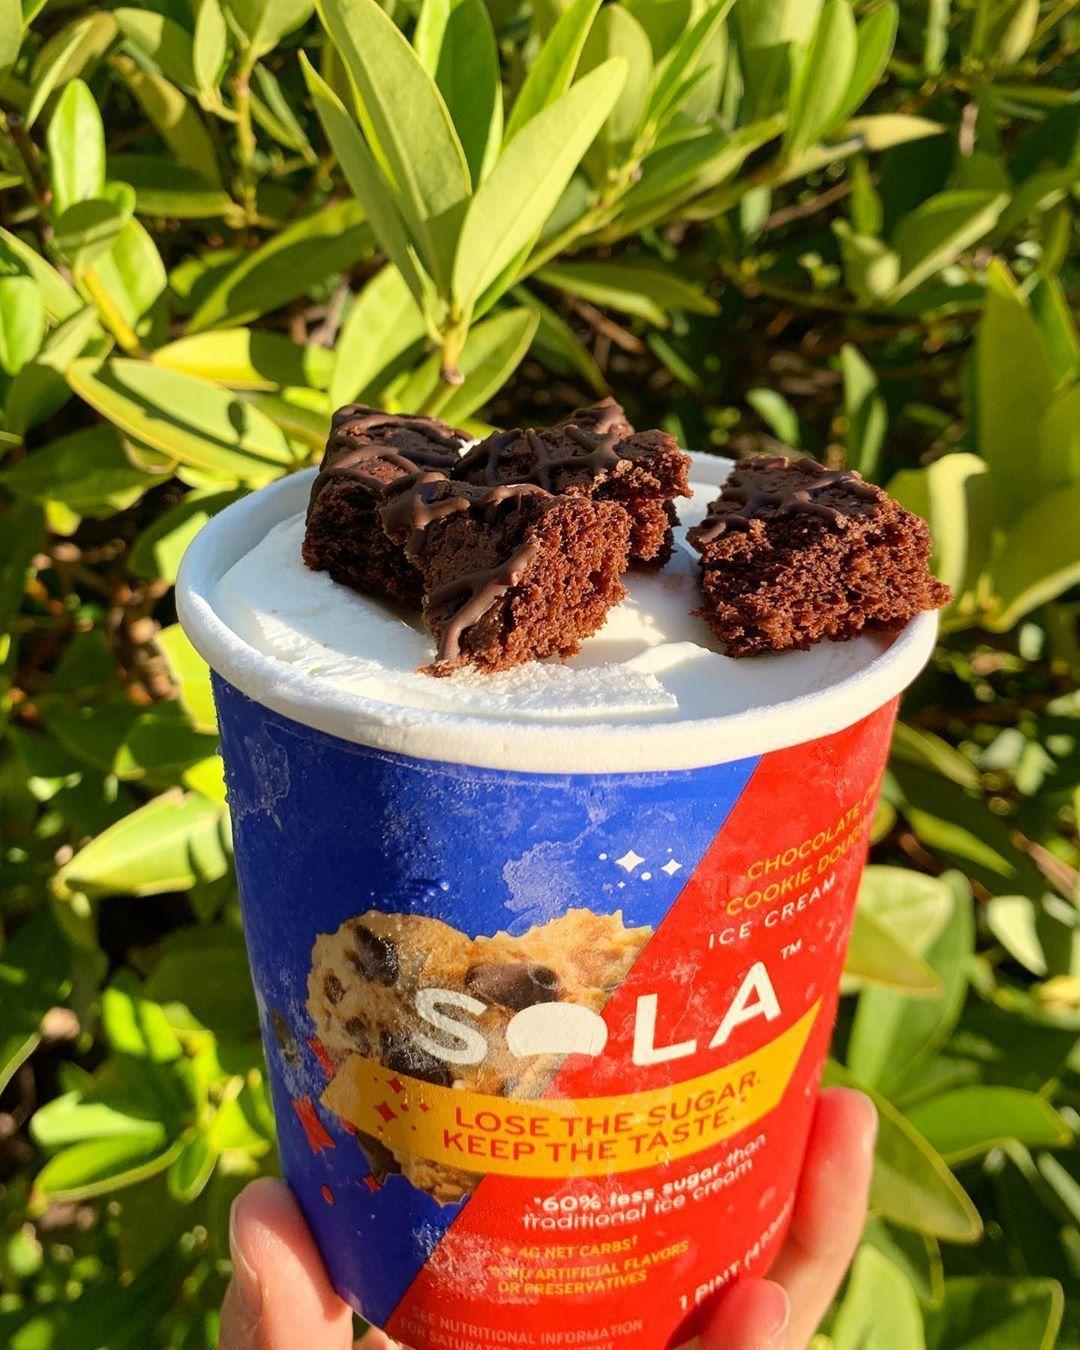 Shark week or daily ice cream craving!?  Shark week or daily ice cream craving!? #sharkweekfood Shark week or daily ice cream craving!?  Shark week or daily ice cream craving!? #sharkweekfood